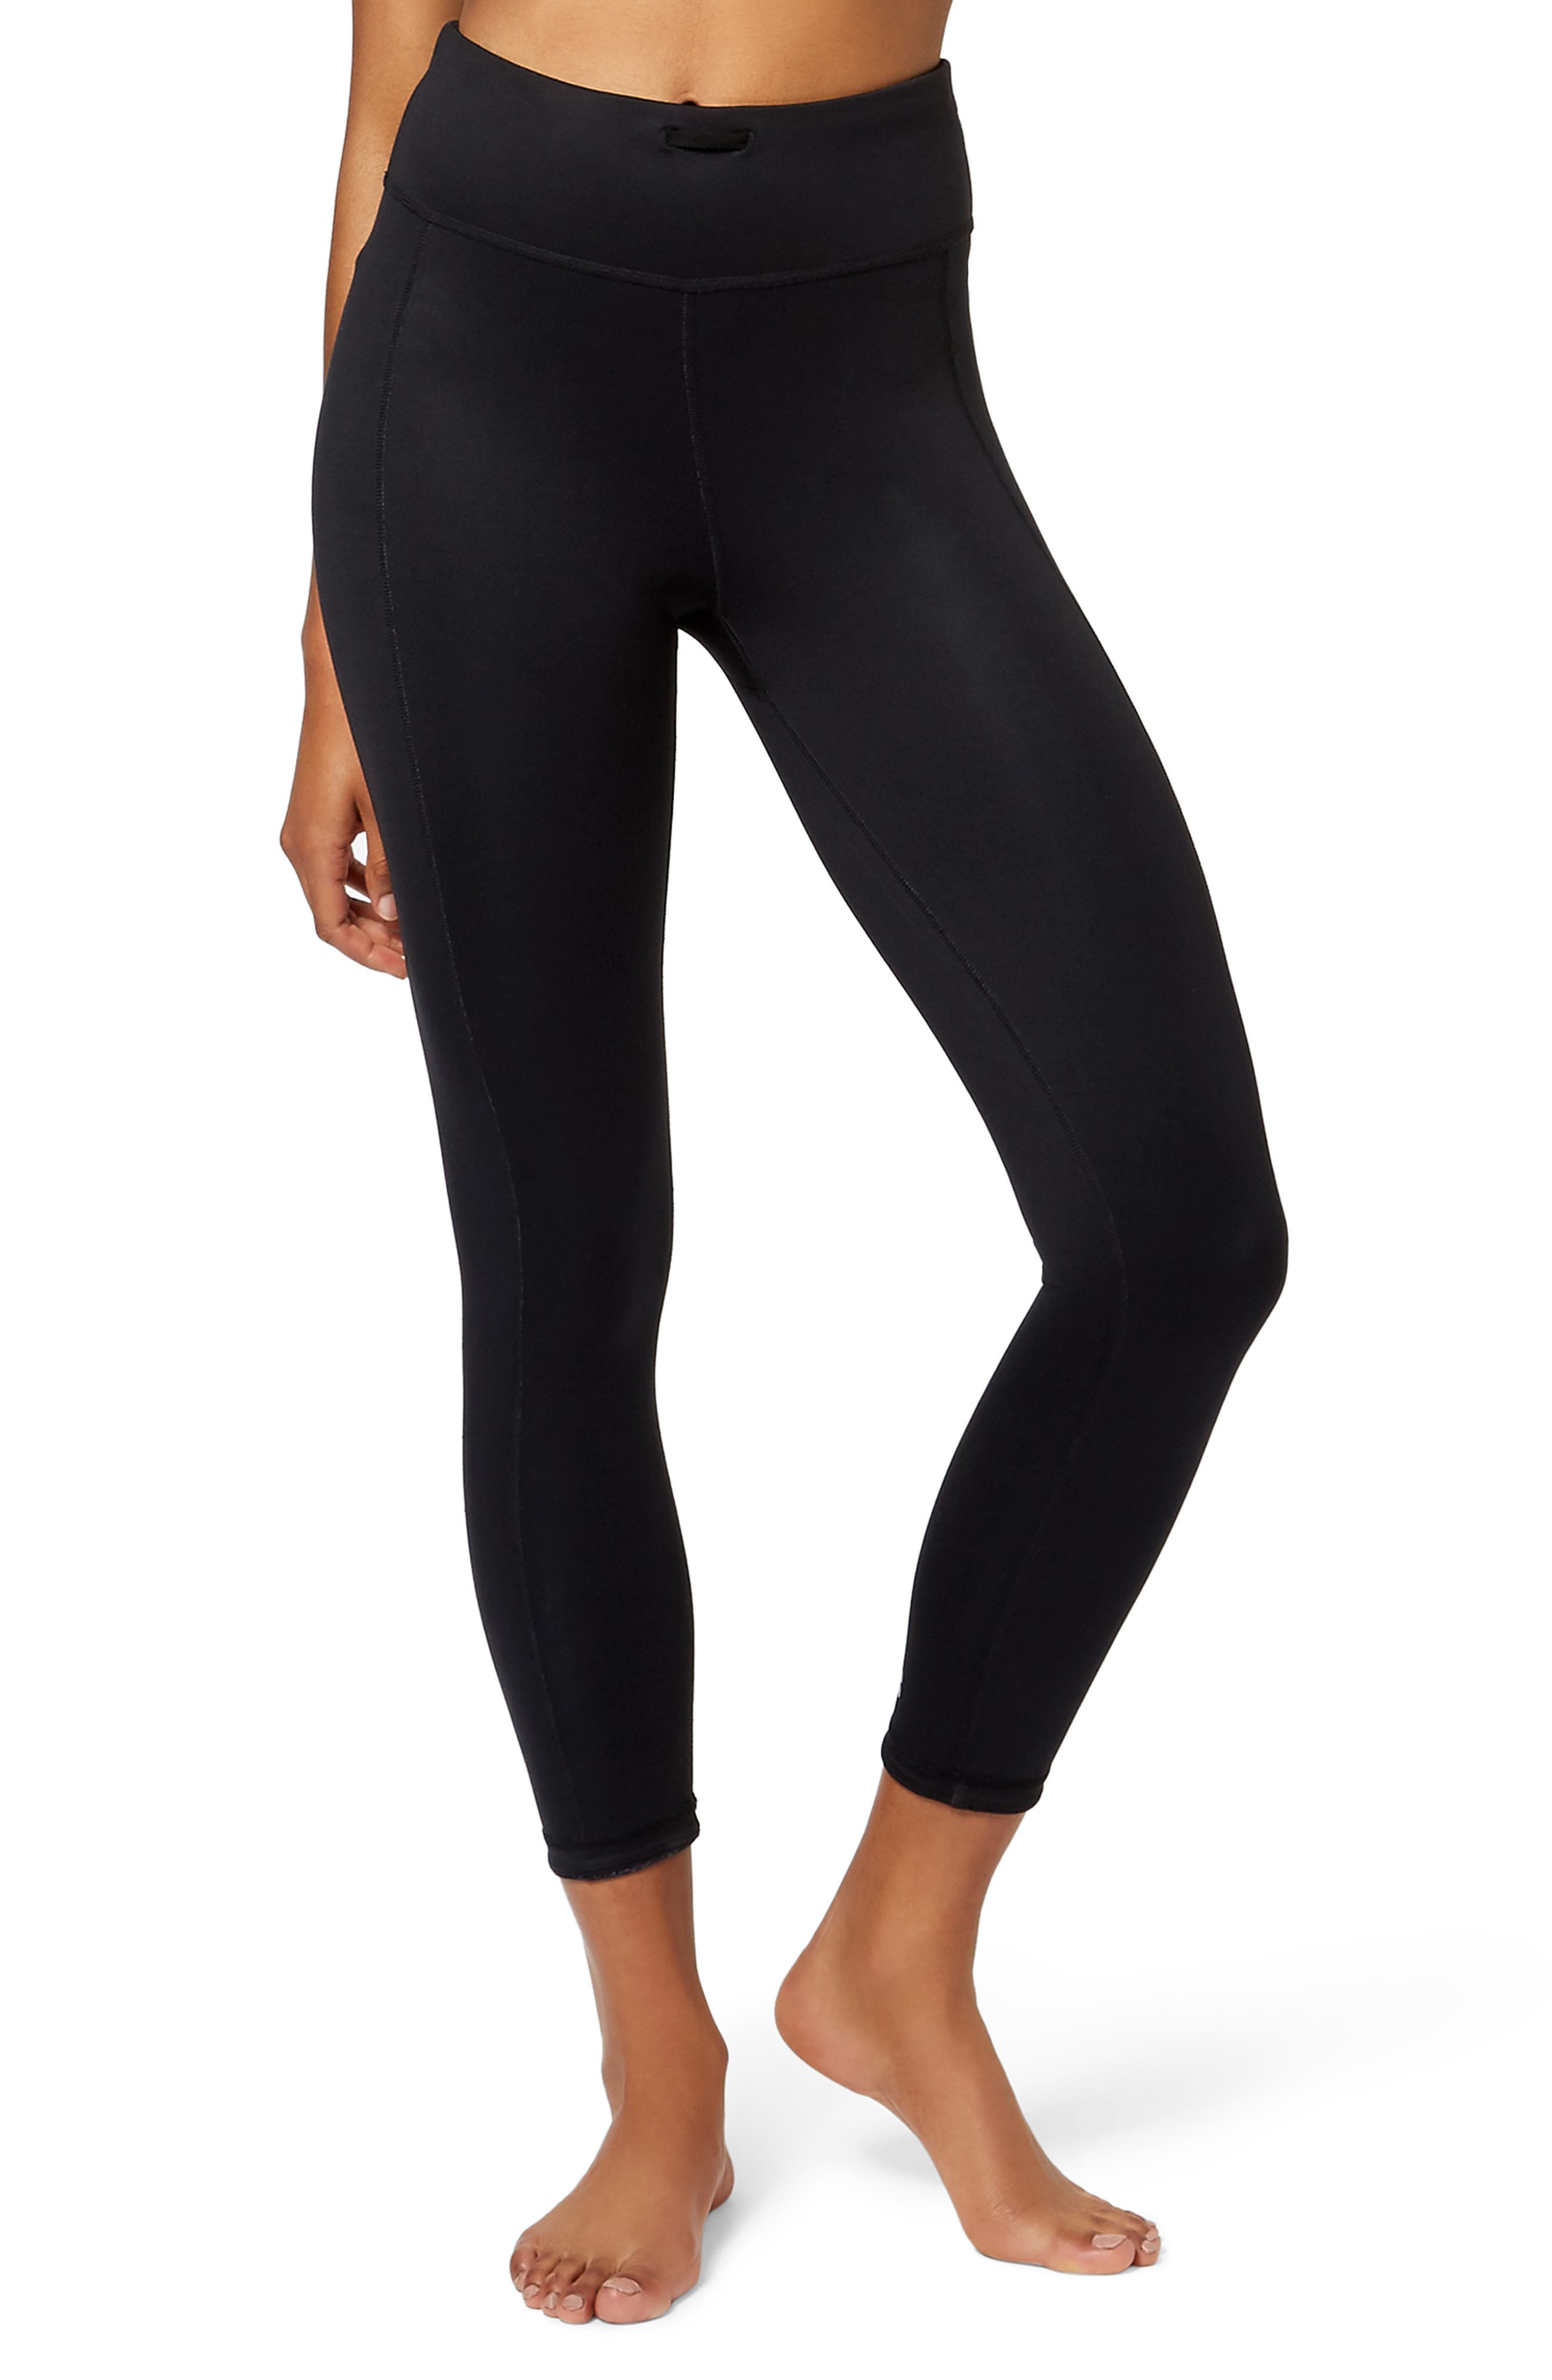 Double Duty Reversible Yoga Leggings,                             Alternate thumbnail 2, color,                             BLACK SPRAY PAINT FLORAL